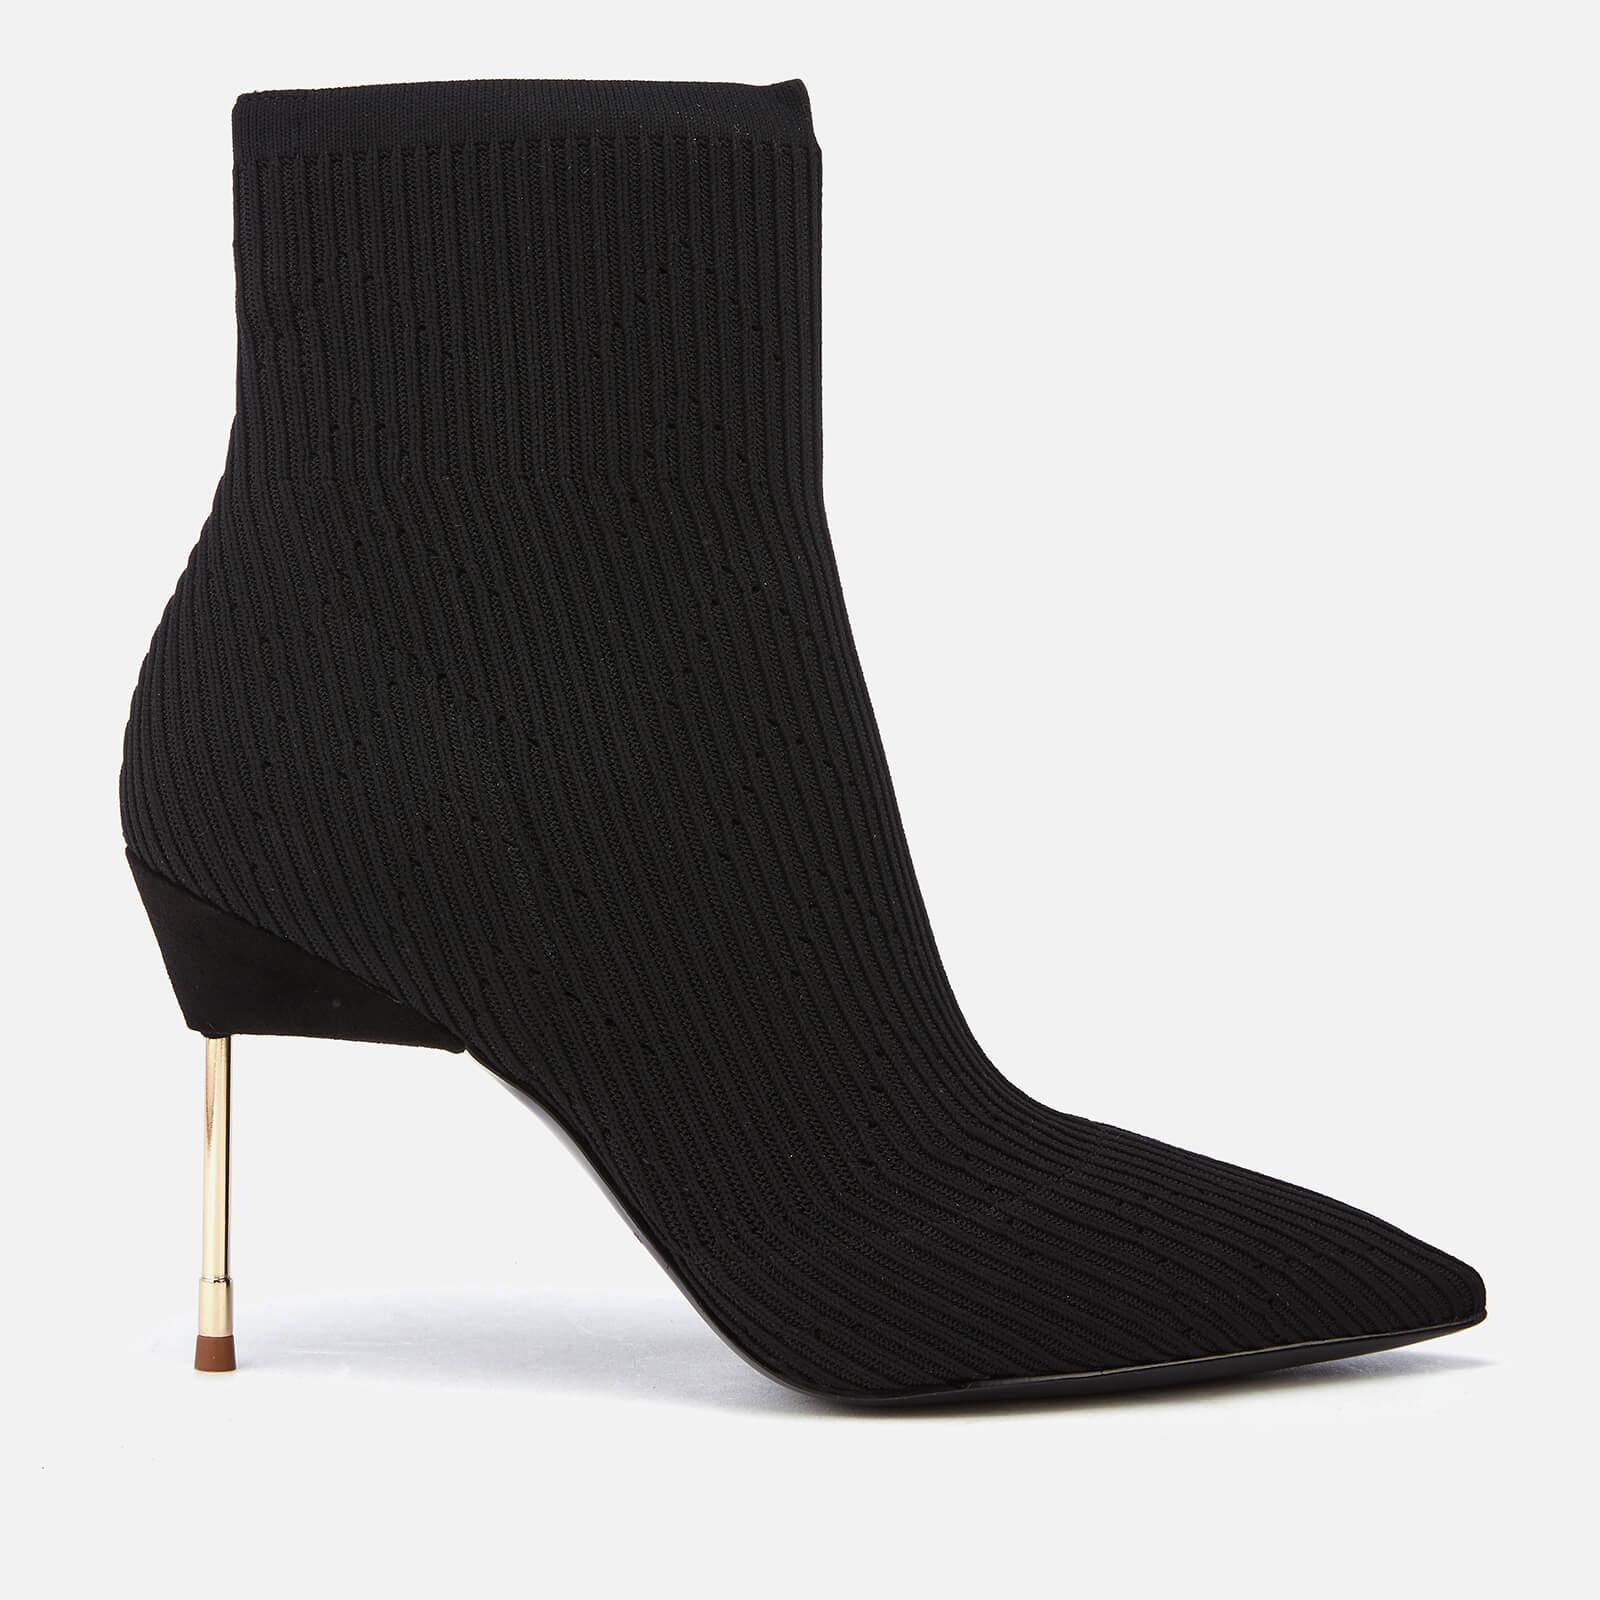 Kurt Geiger London Women's Barbican Stretch Heeled Ankle Boots - Black - UK 4